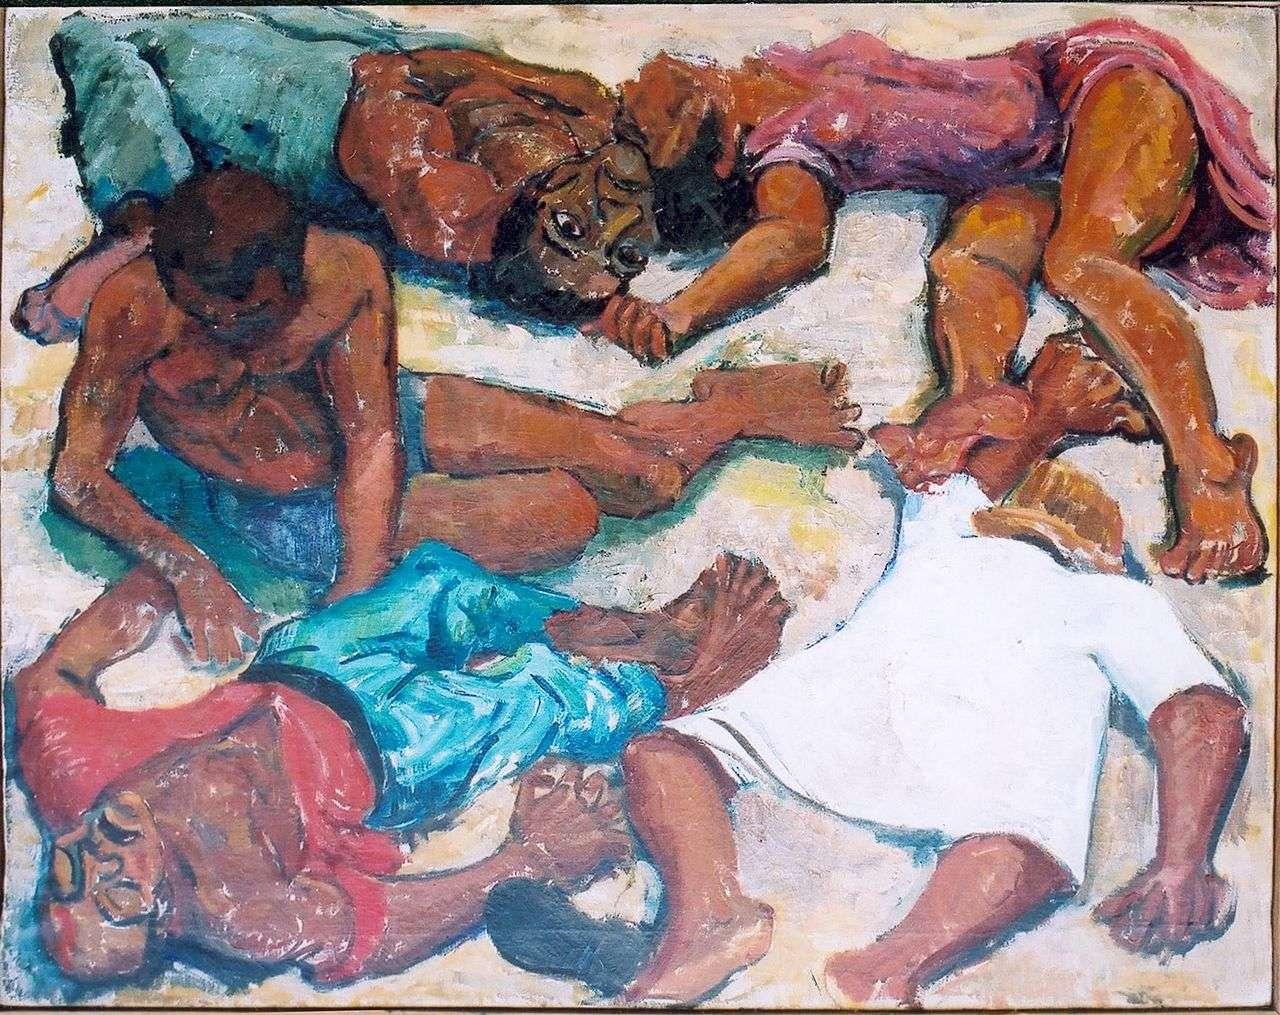 Sharpeville 21 March 1960 Godfrey Rubens